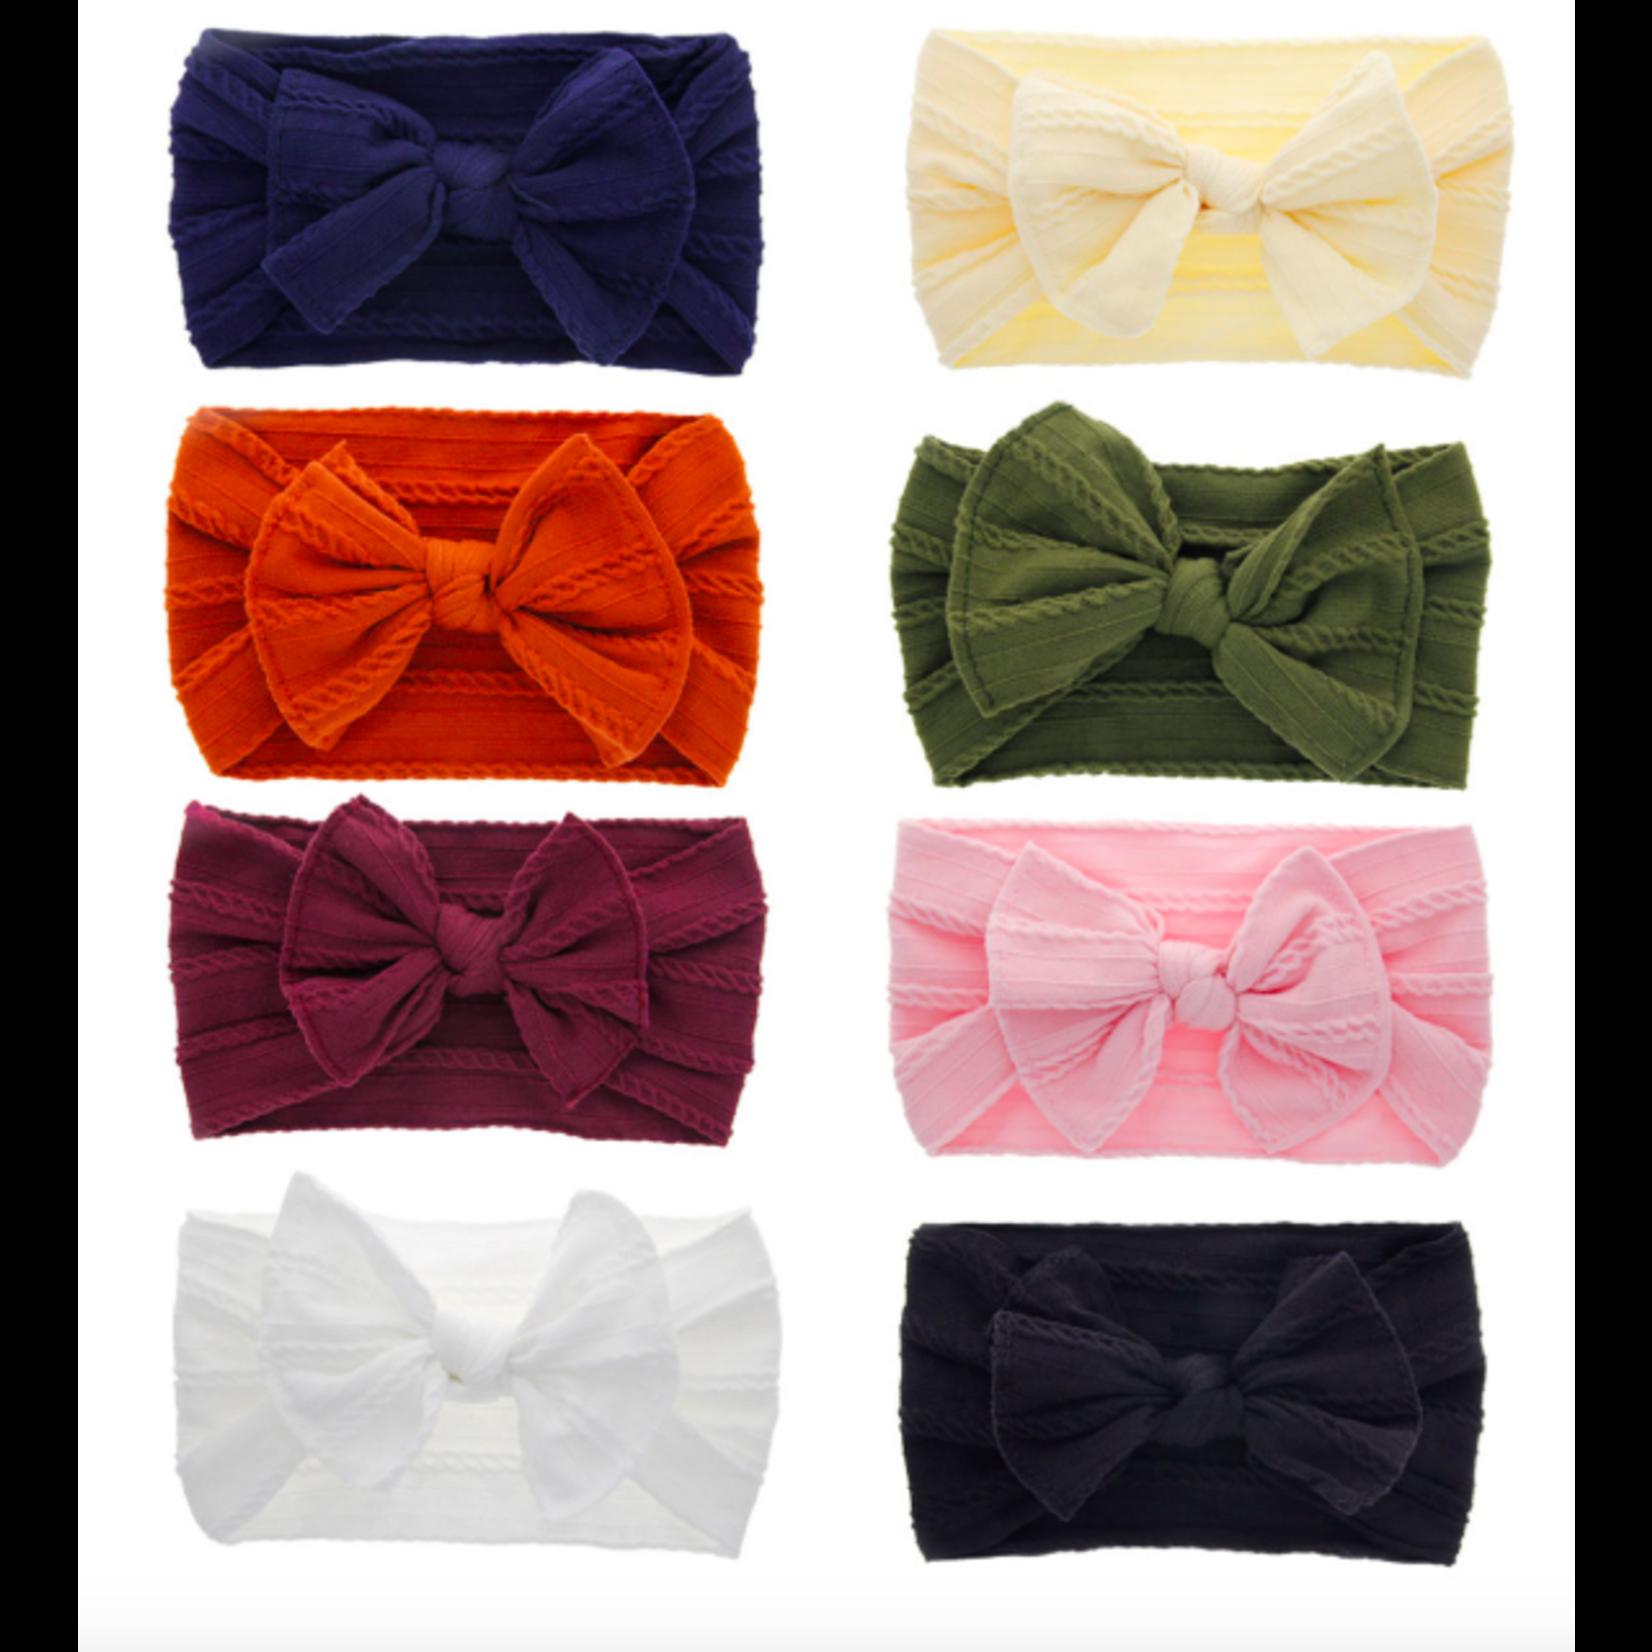 FT Pembroke Siena Soft Bow headband - Olive